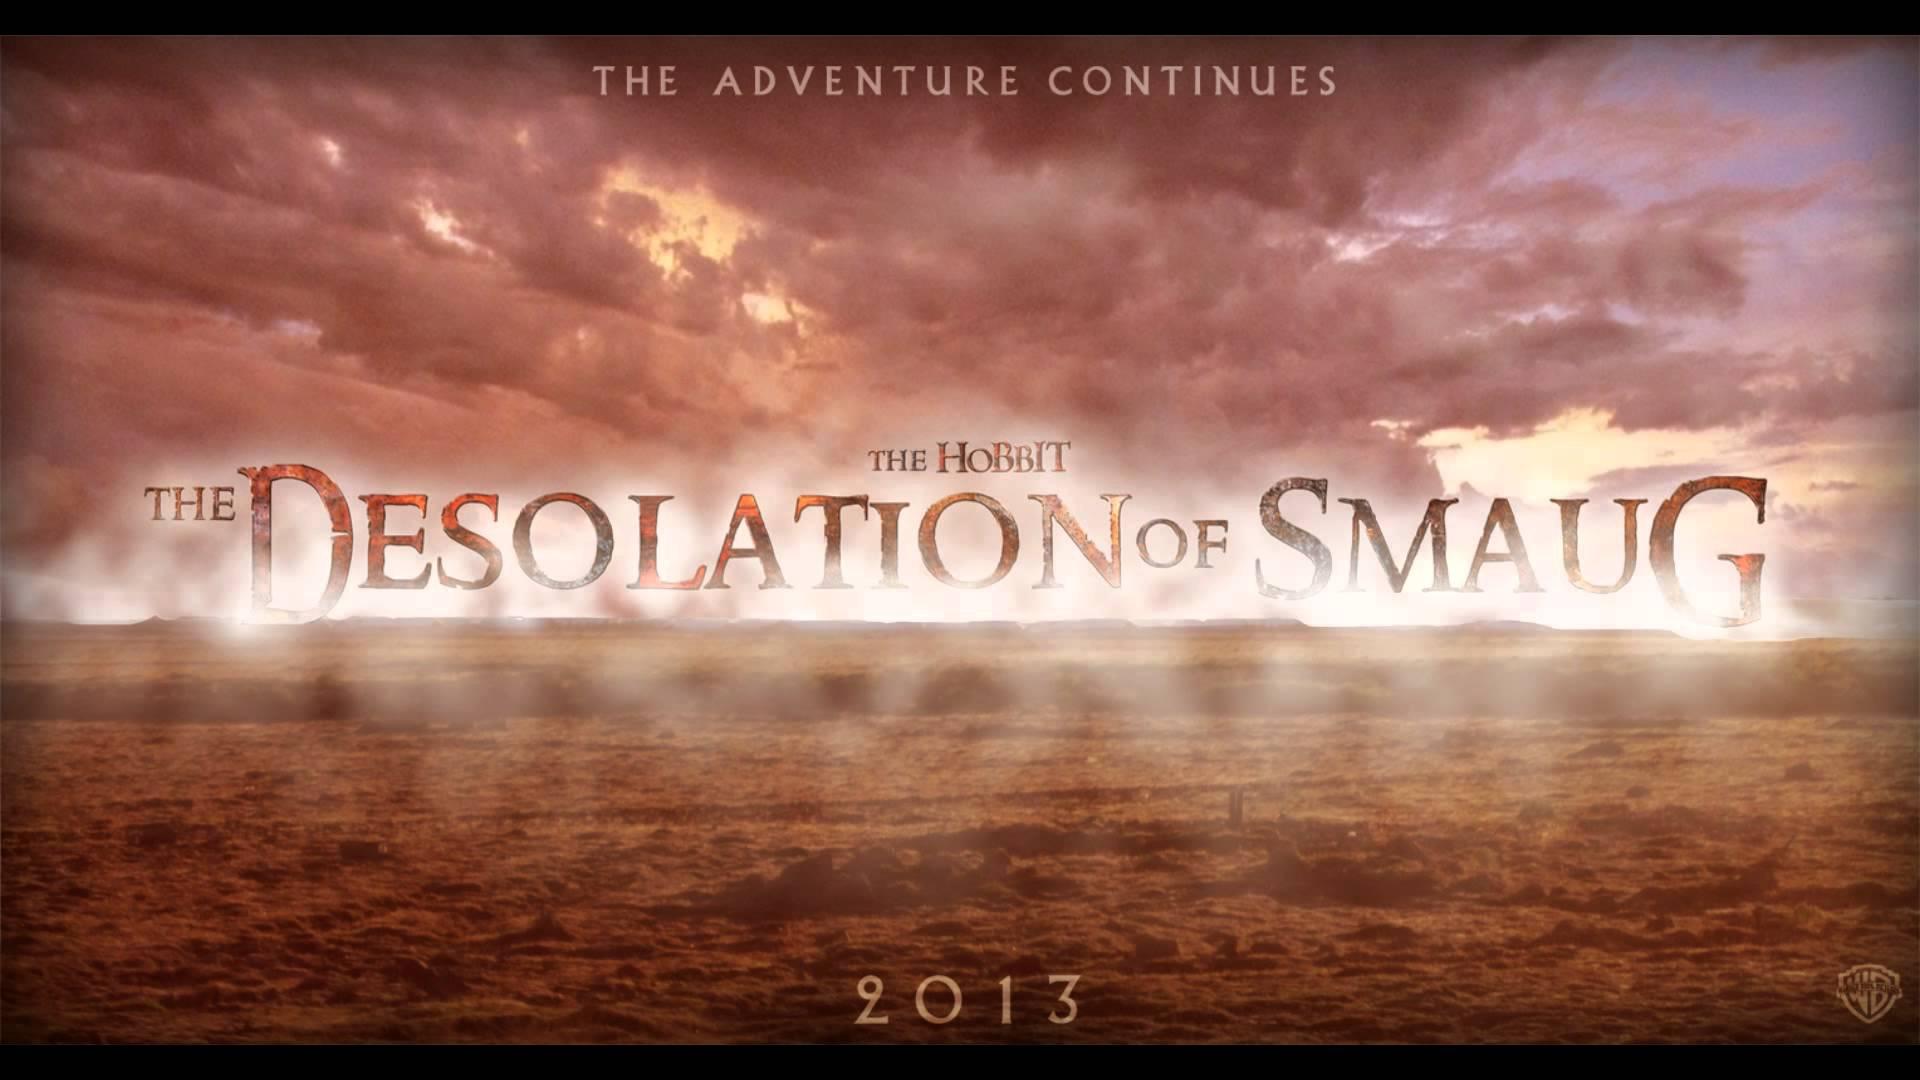 The Hobbit the Desolation of Smaug wallpaper 4